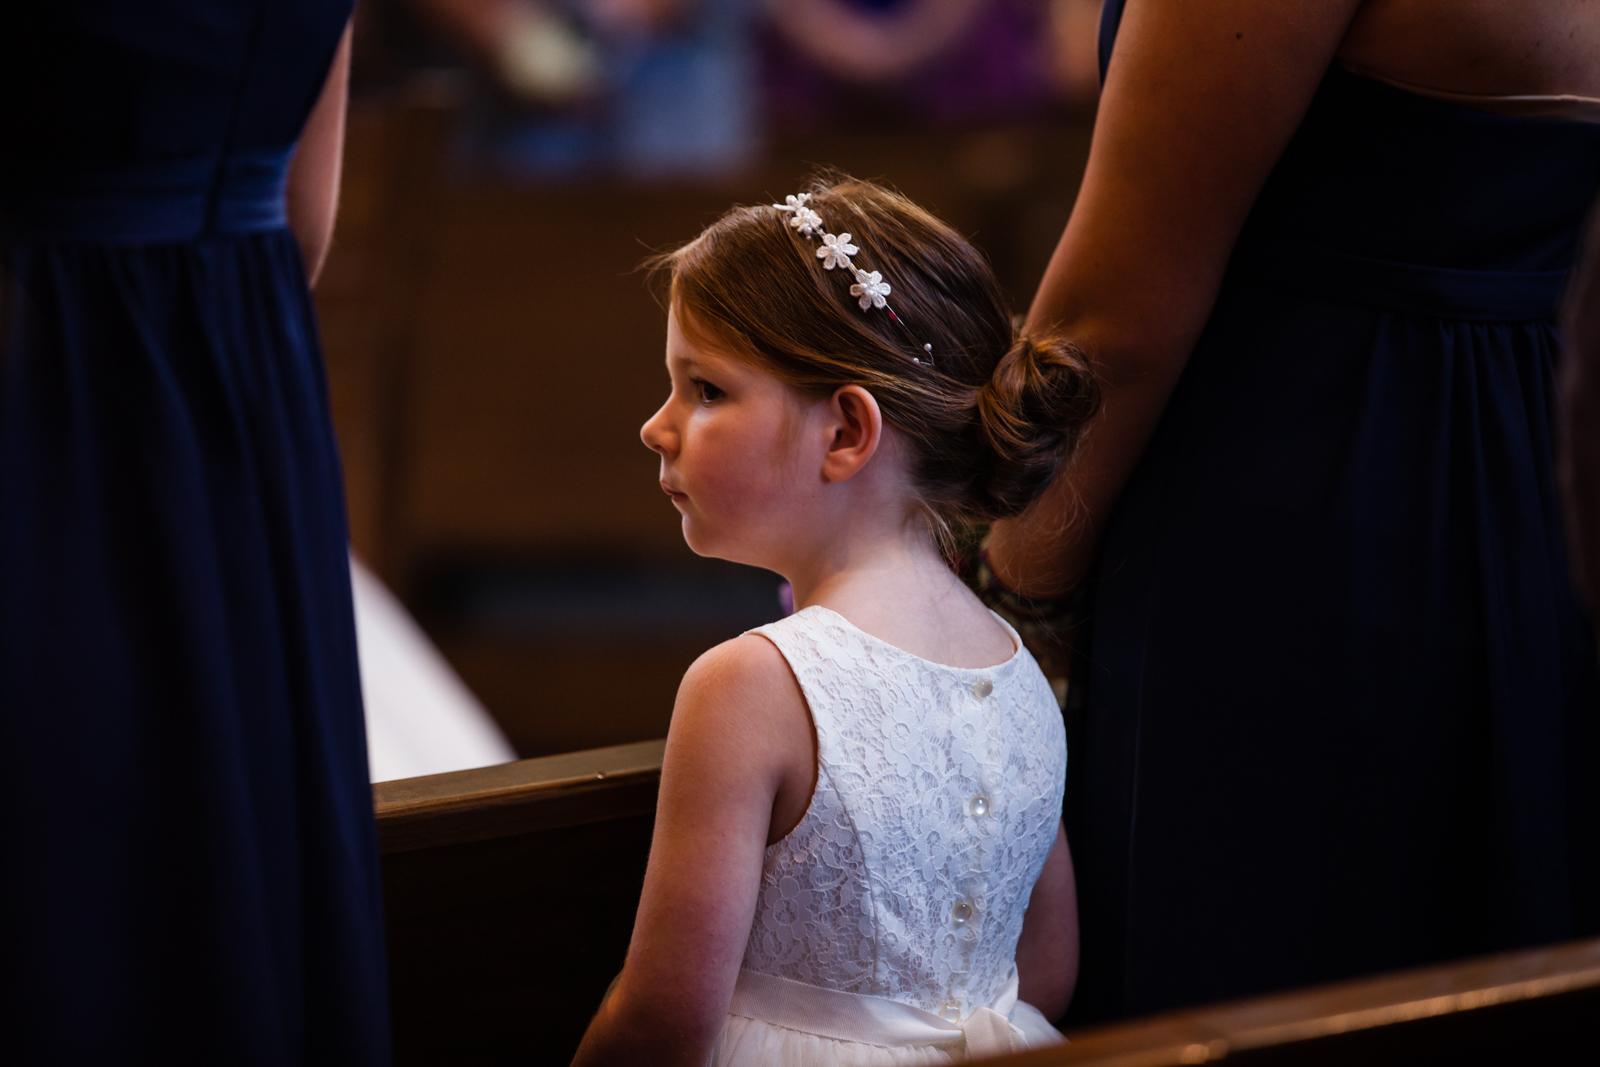 Eastons-Beach-Rotunda-Ballroom-Wedding-Newport-Rhode-Island-PhotographybyAmandaMorgan-32.jpg